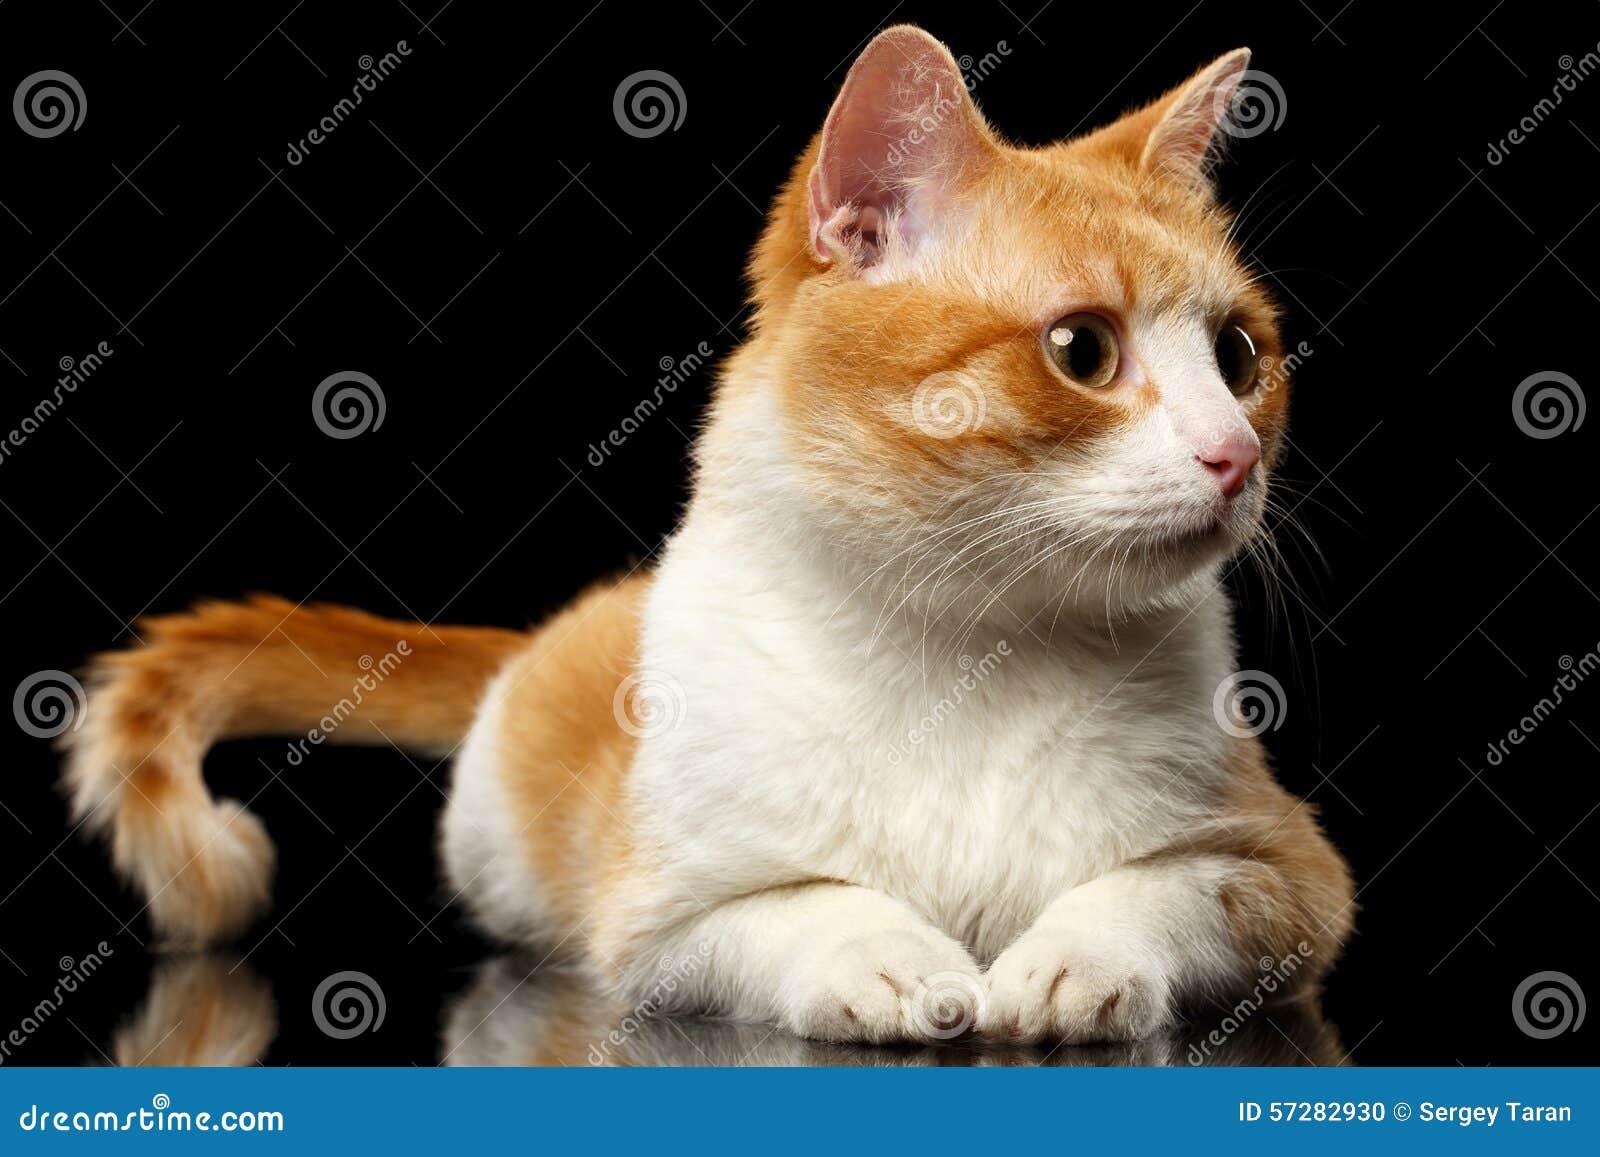 Ginger Cat Surprised Looking de mentira en la derecha en el espejo negro